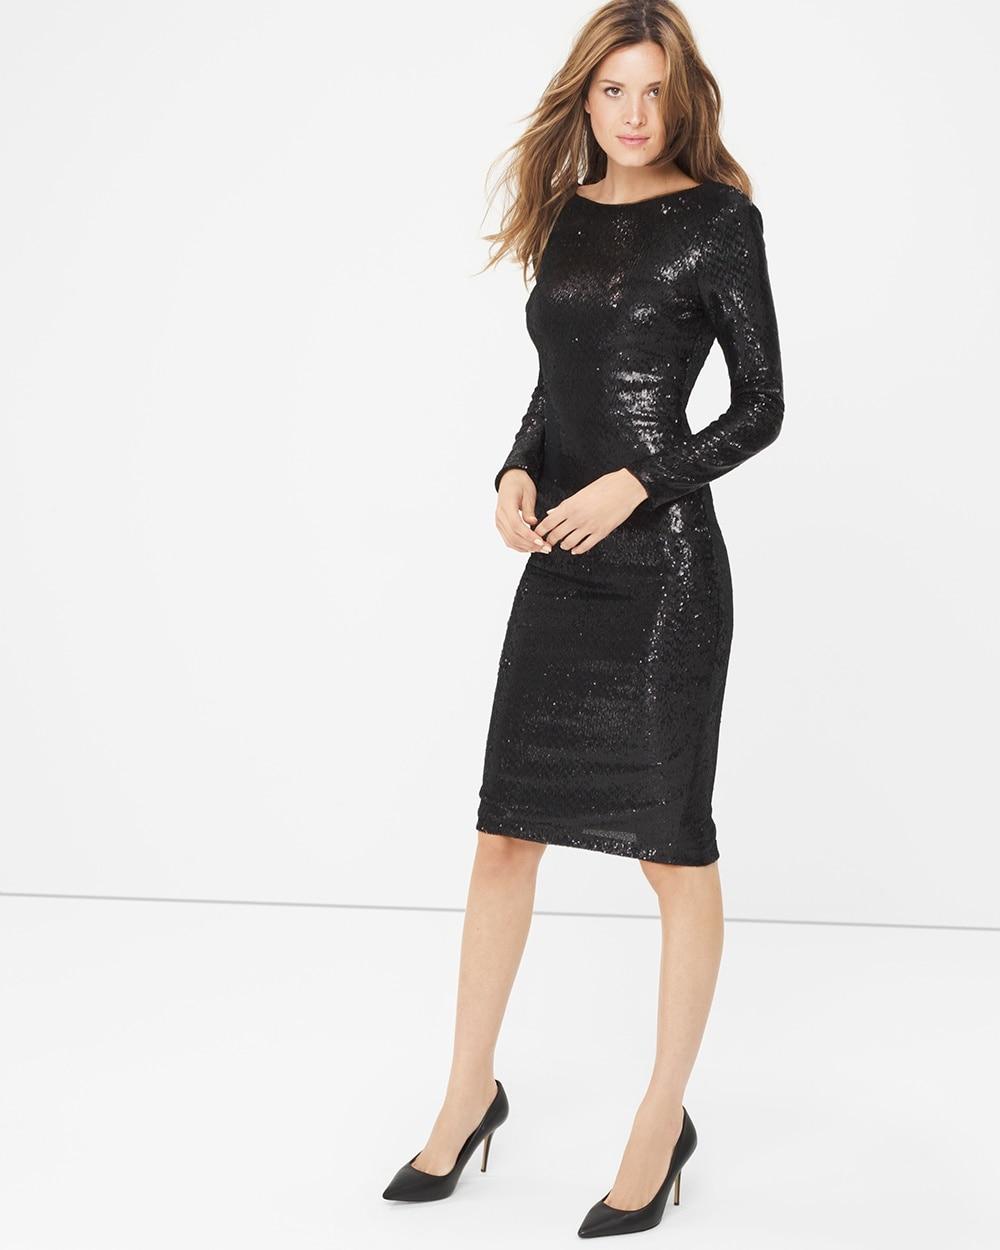 Long Sleeve Black Sequin Sheath Dress White House Black Market